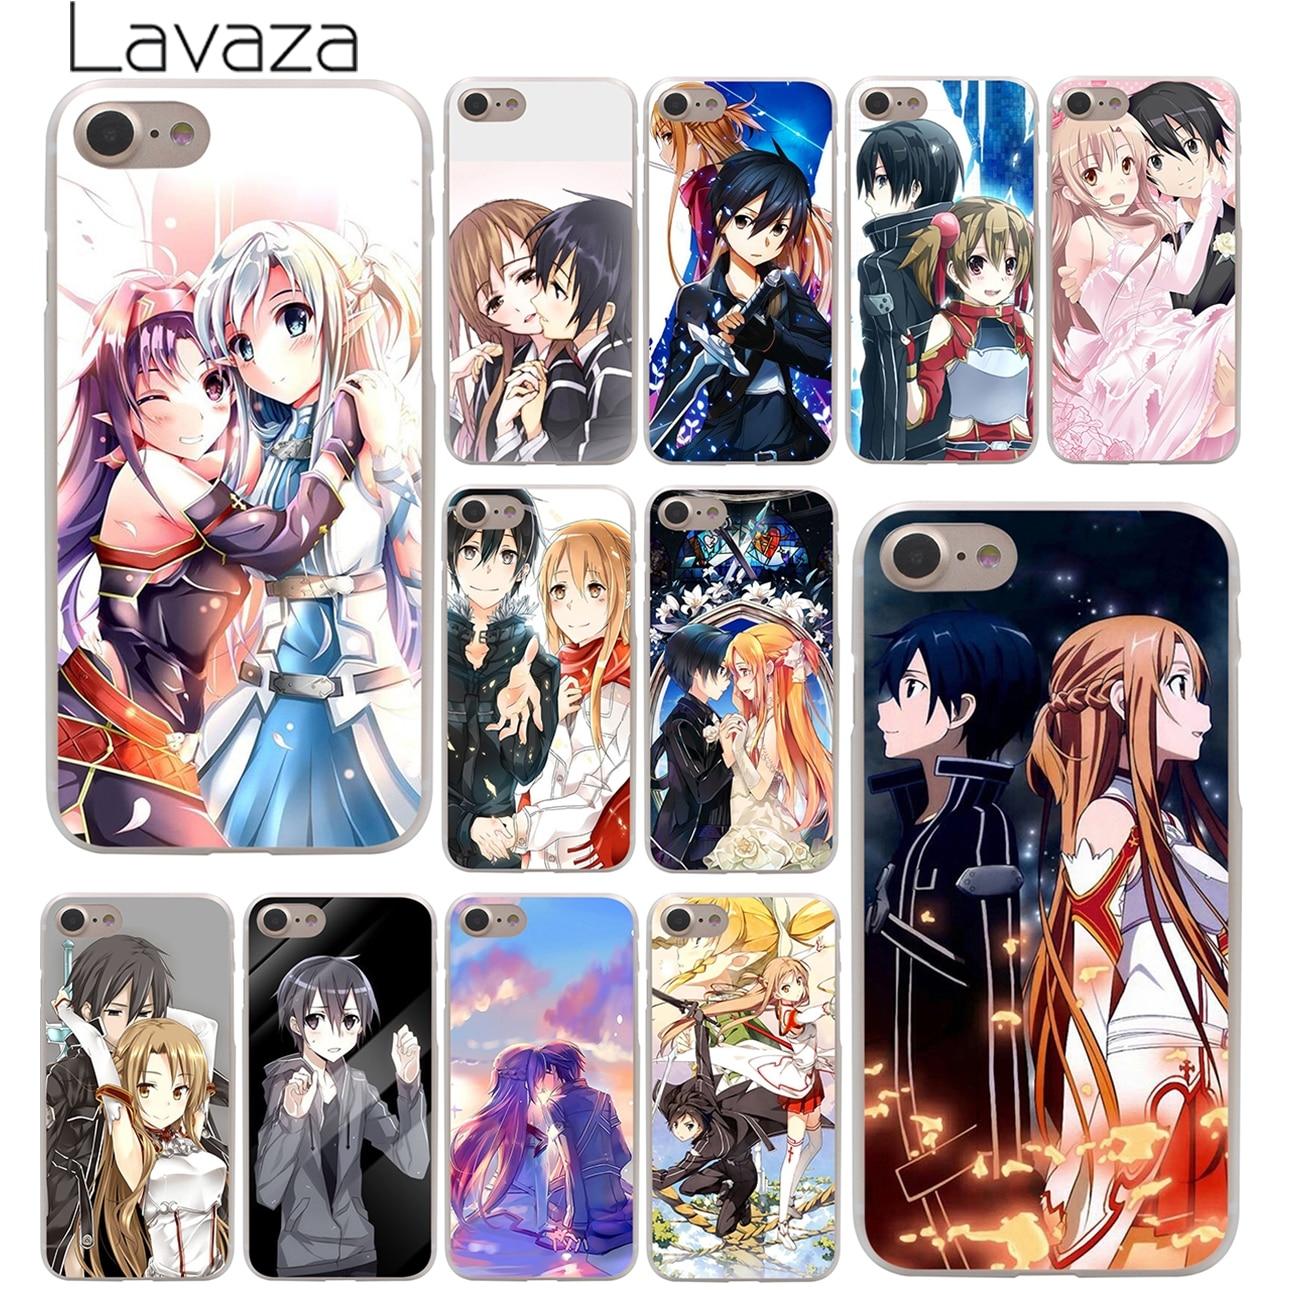 Lavaza Anime Sword Art Online game girl Asuna Krito Hard Case for iPhone 10 X 8 7 6 6s Plus 5 5S SE 5C 4 4S